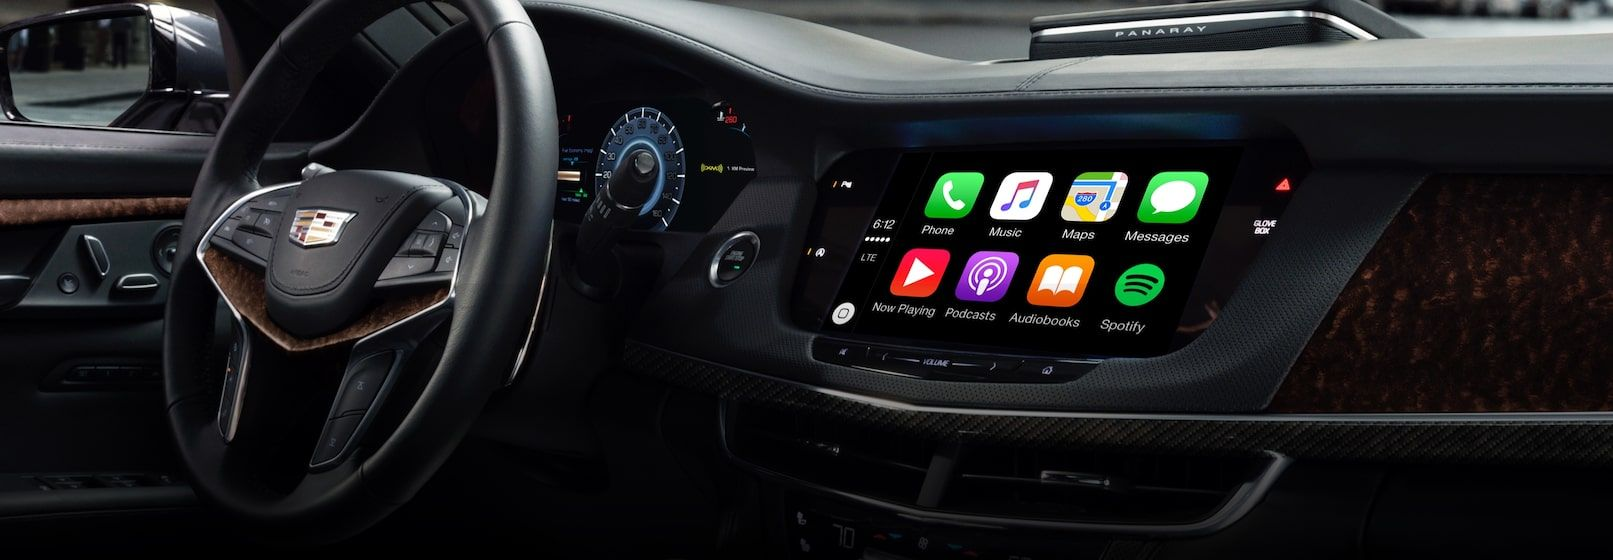 Infotainment with Apple CarPlay